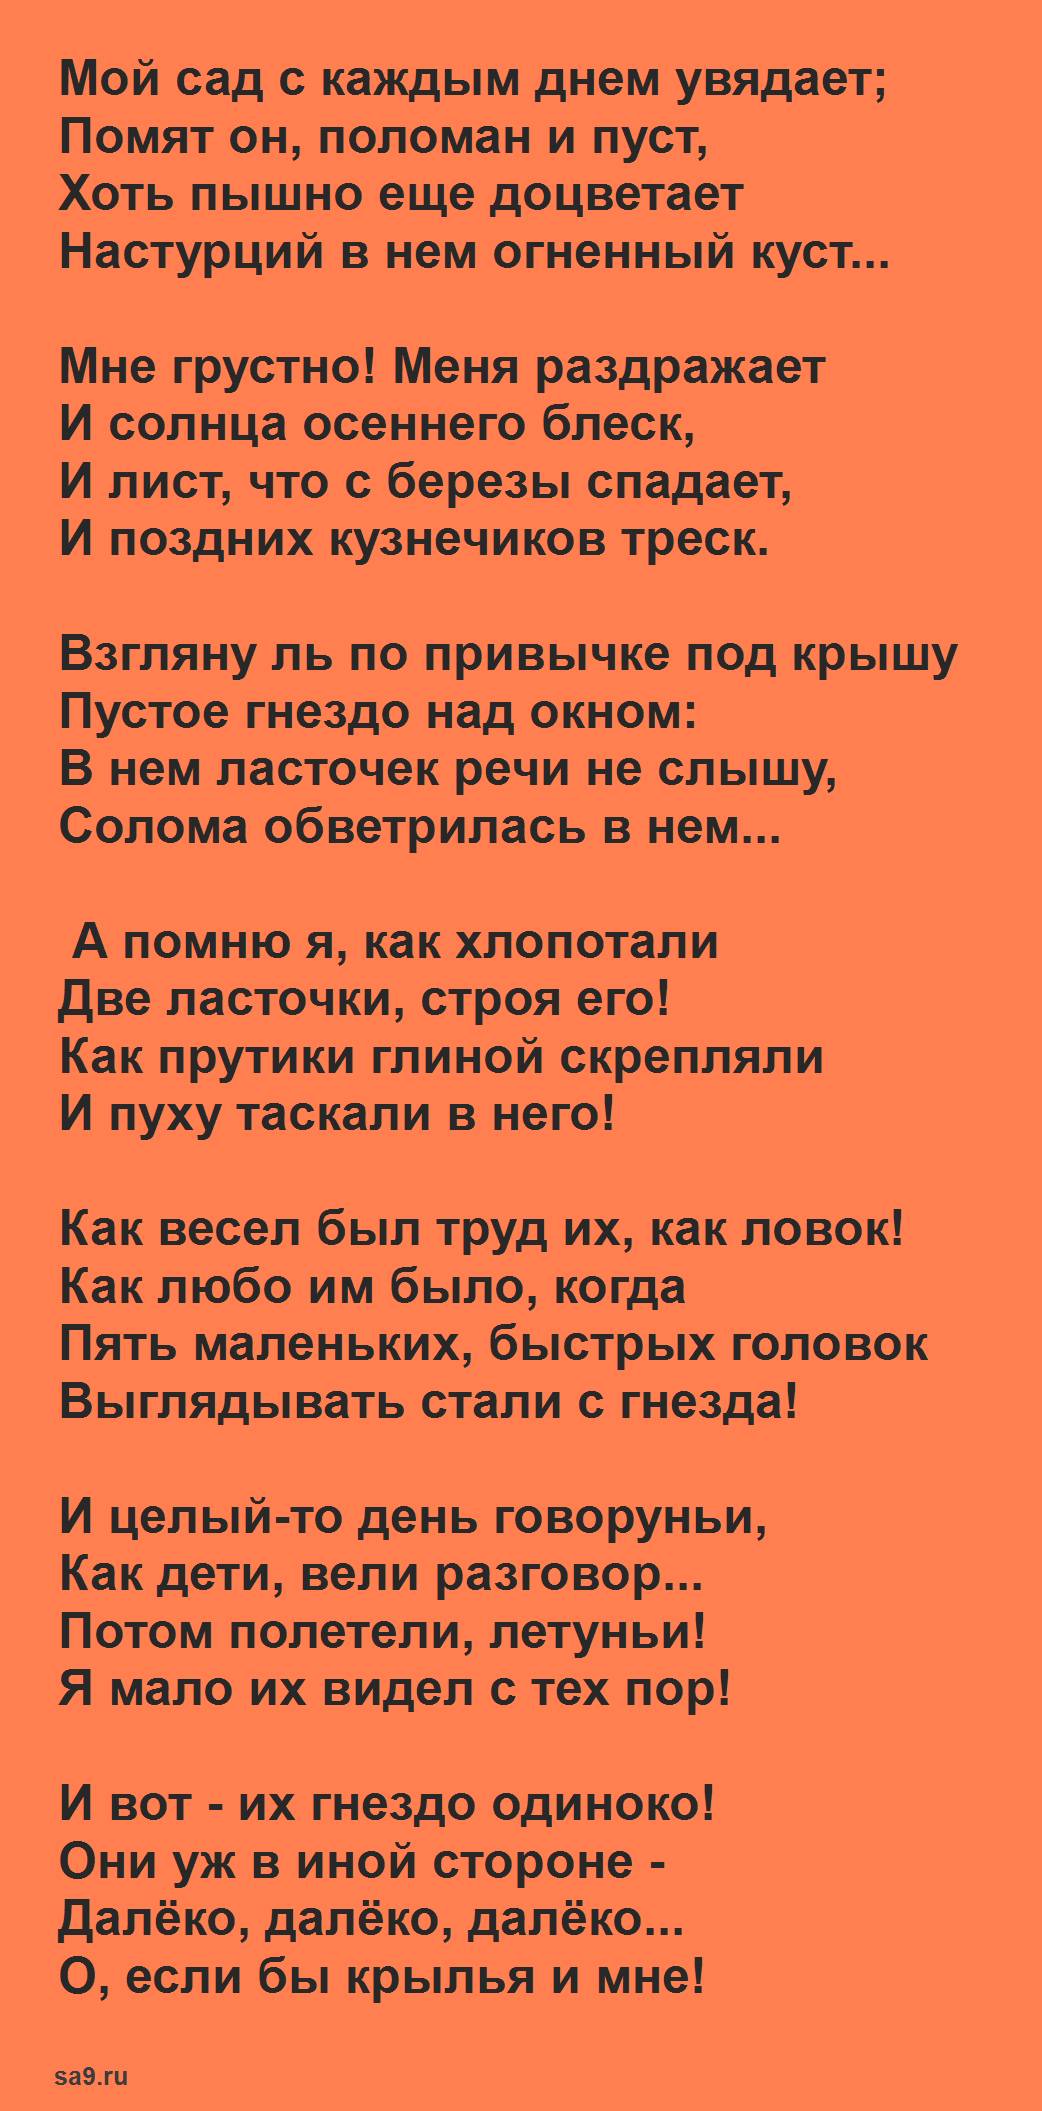 Читать стихи Майкова - Ласточки